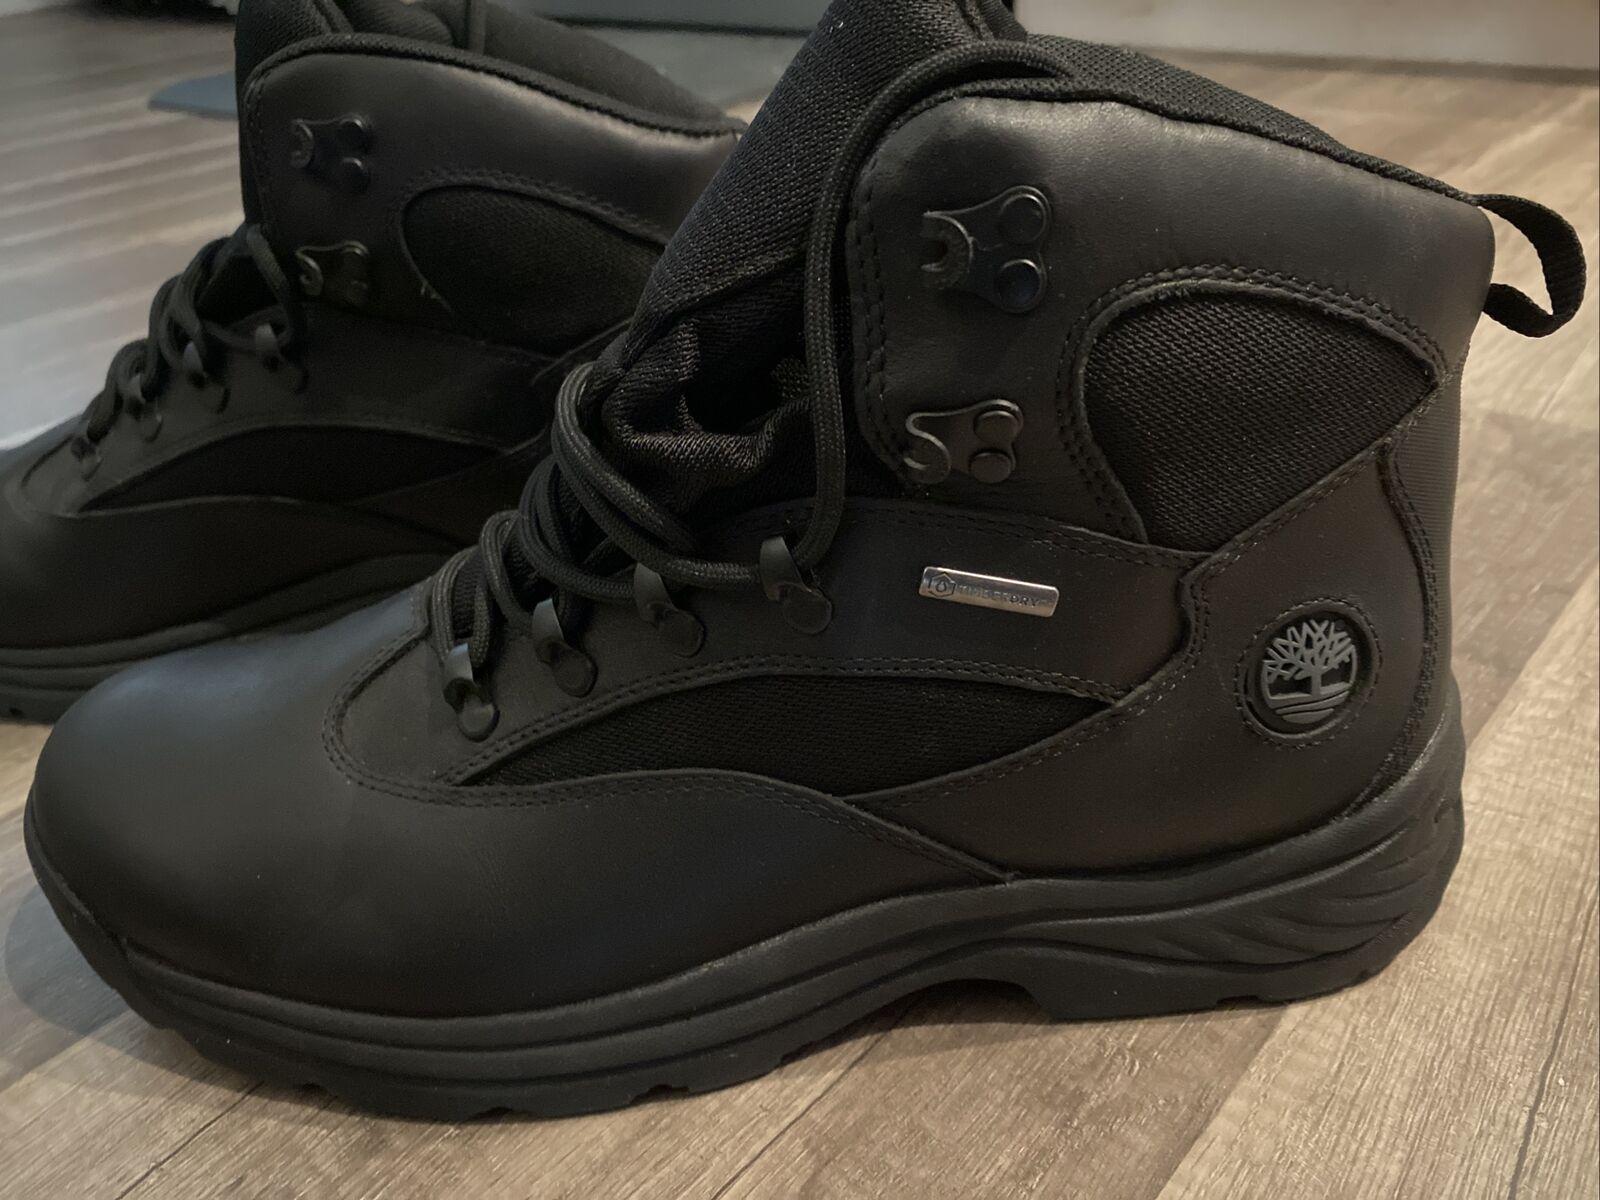 enlazar A rayas triple  SALE Timberland Men's Chocorua Trail Waterproof Hiking Boot Black SZ 13 NEW  for sale online